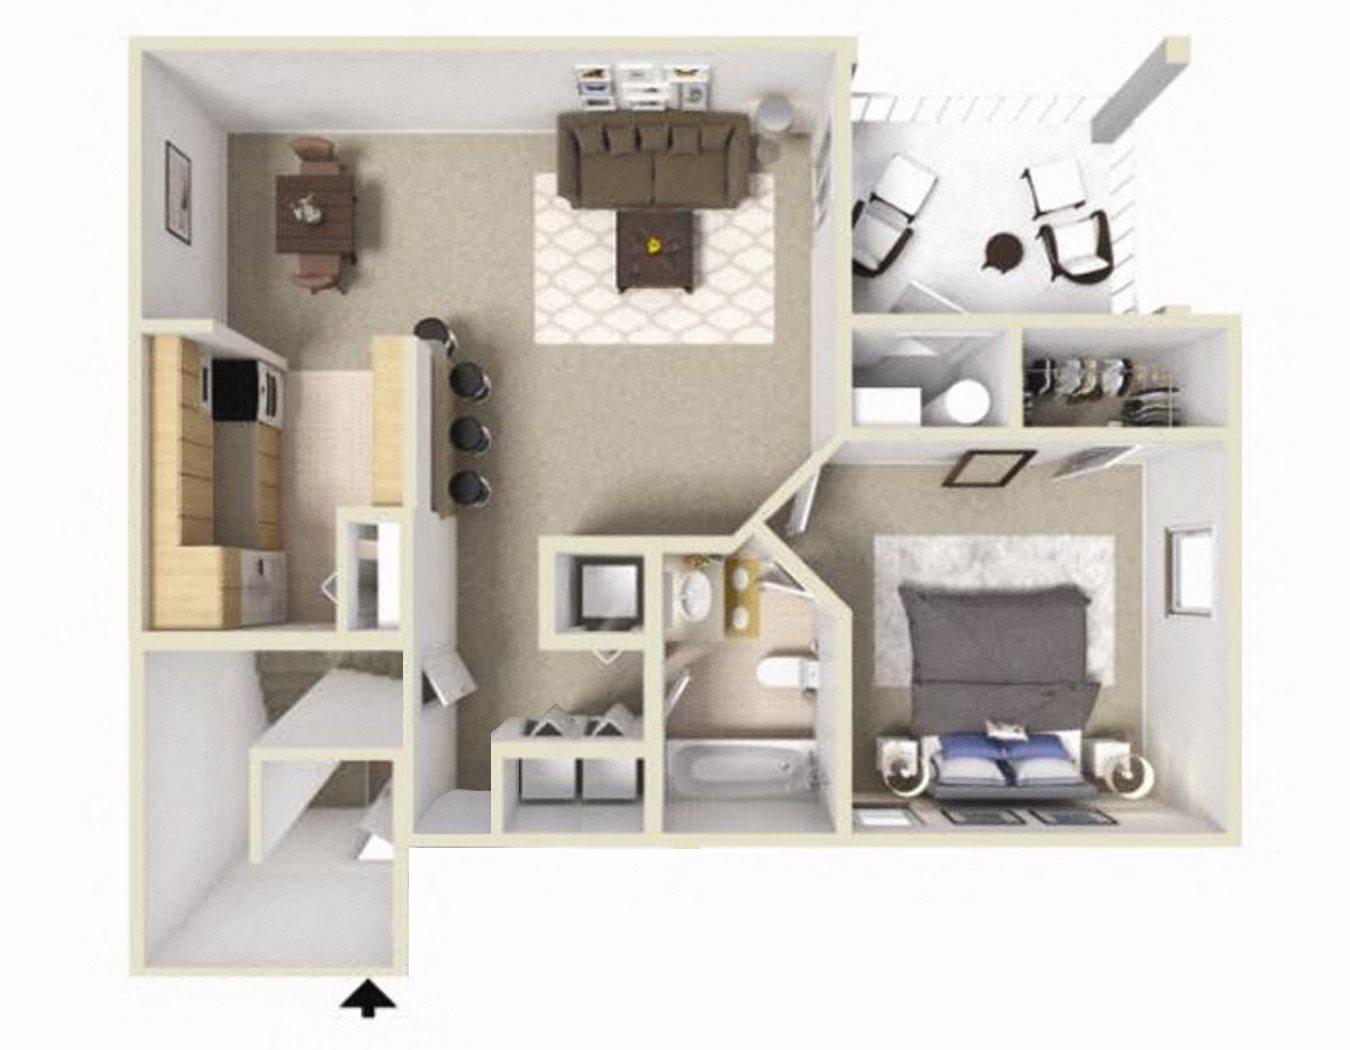 Rosemont II Floor Plan at Ashton Creek Apartments in Chester VA